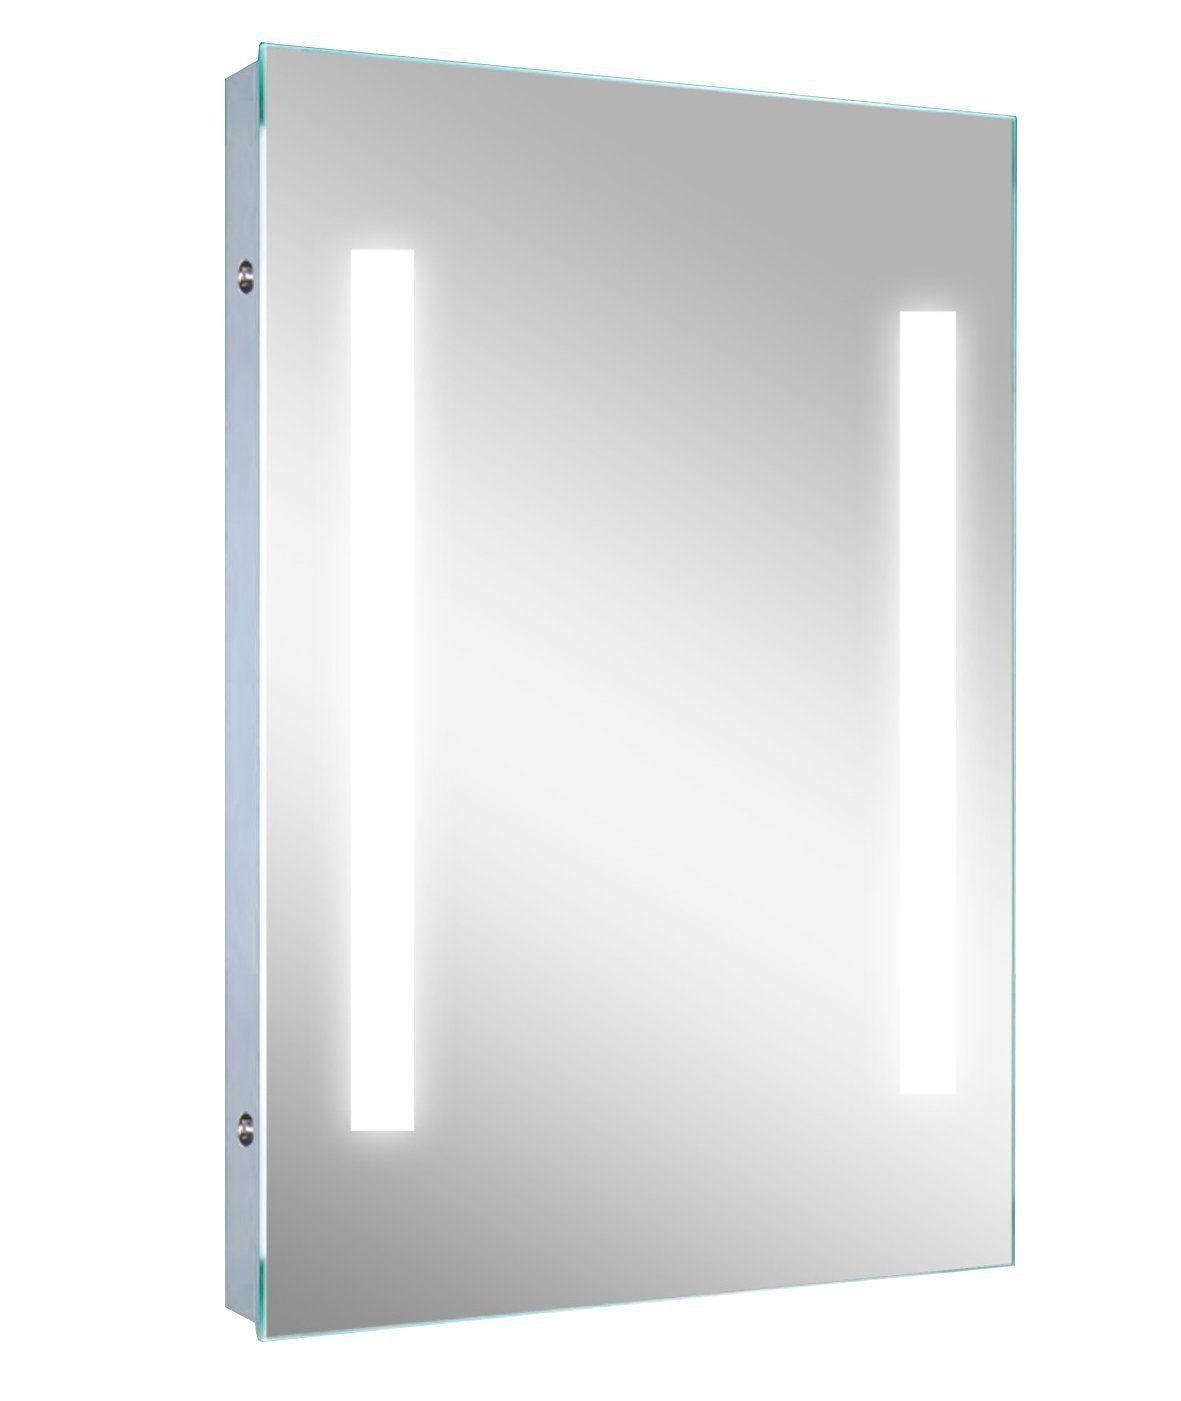 LED Striped Illuminated Mirror. Dimensions: 24\